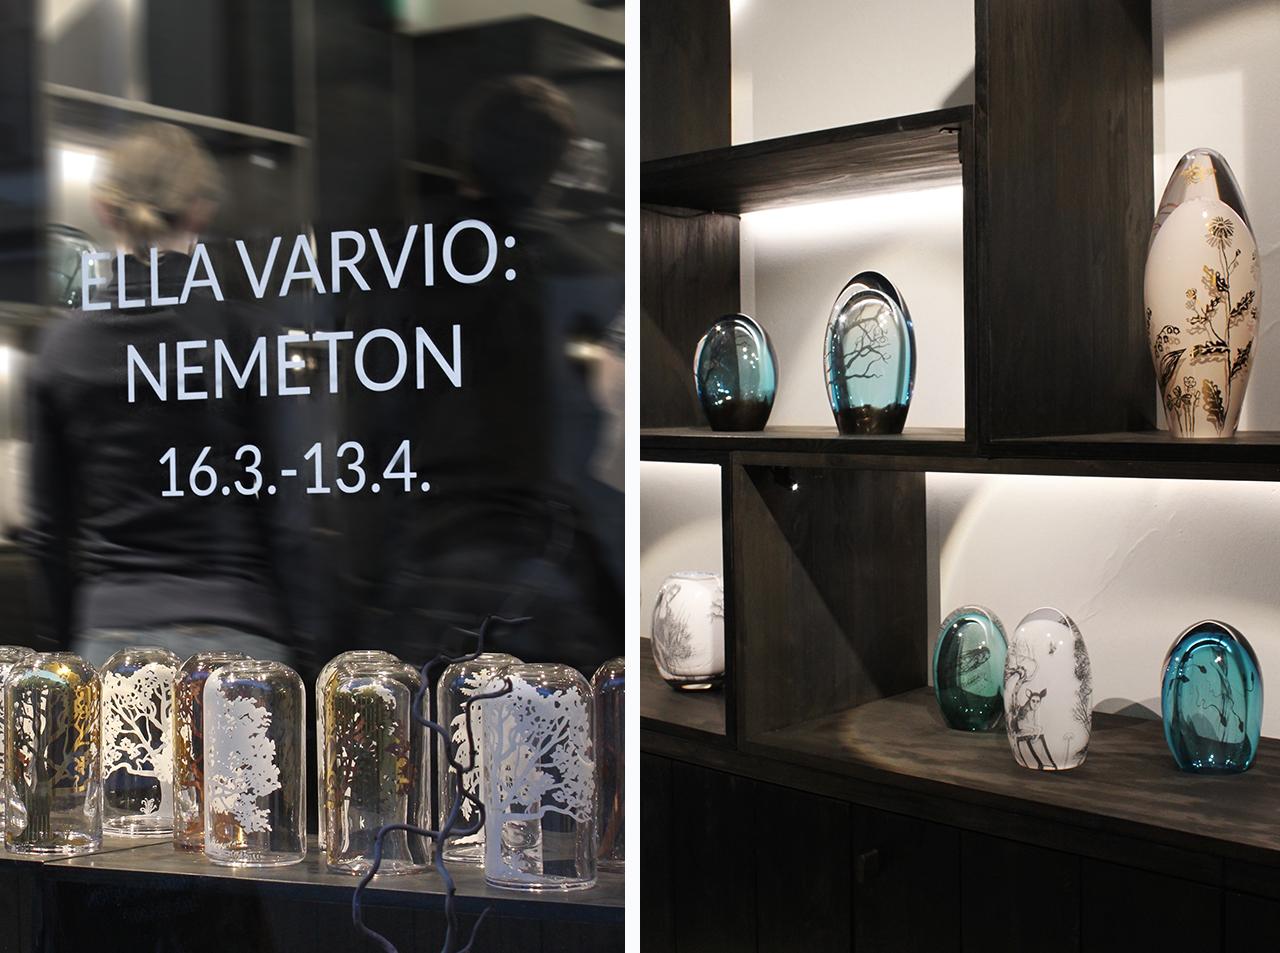 Ella Varvio: Nemeton art glass exhibition at Galleria Mafka&Alakoski.